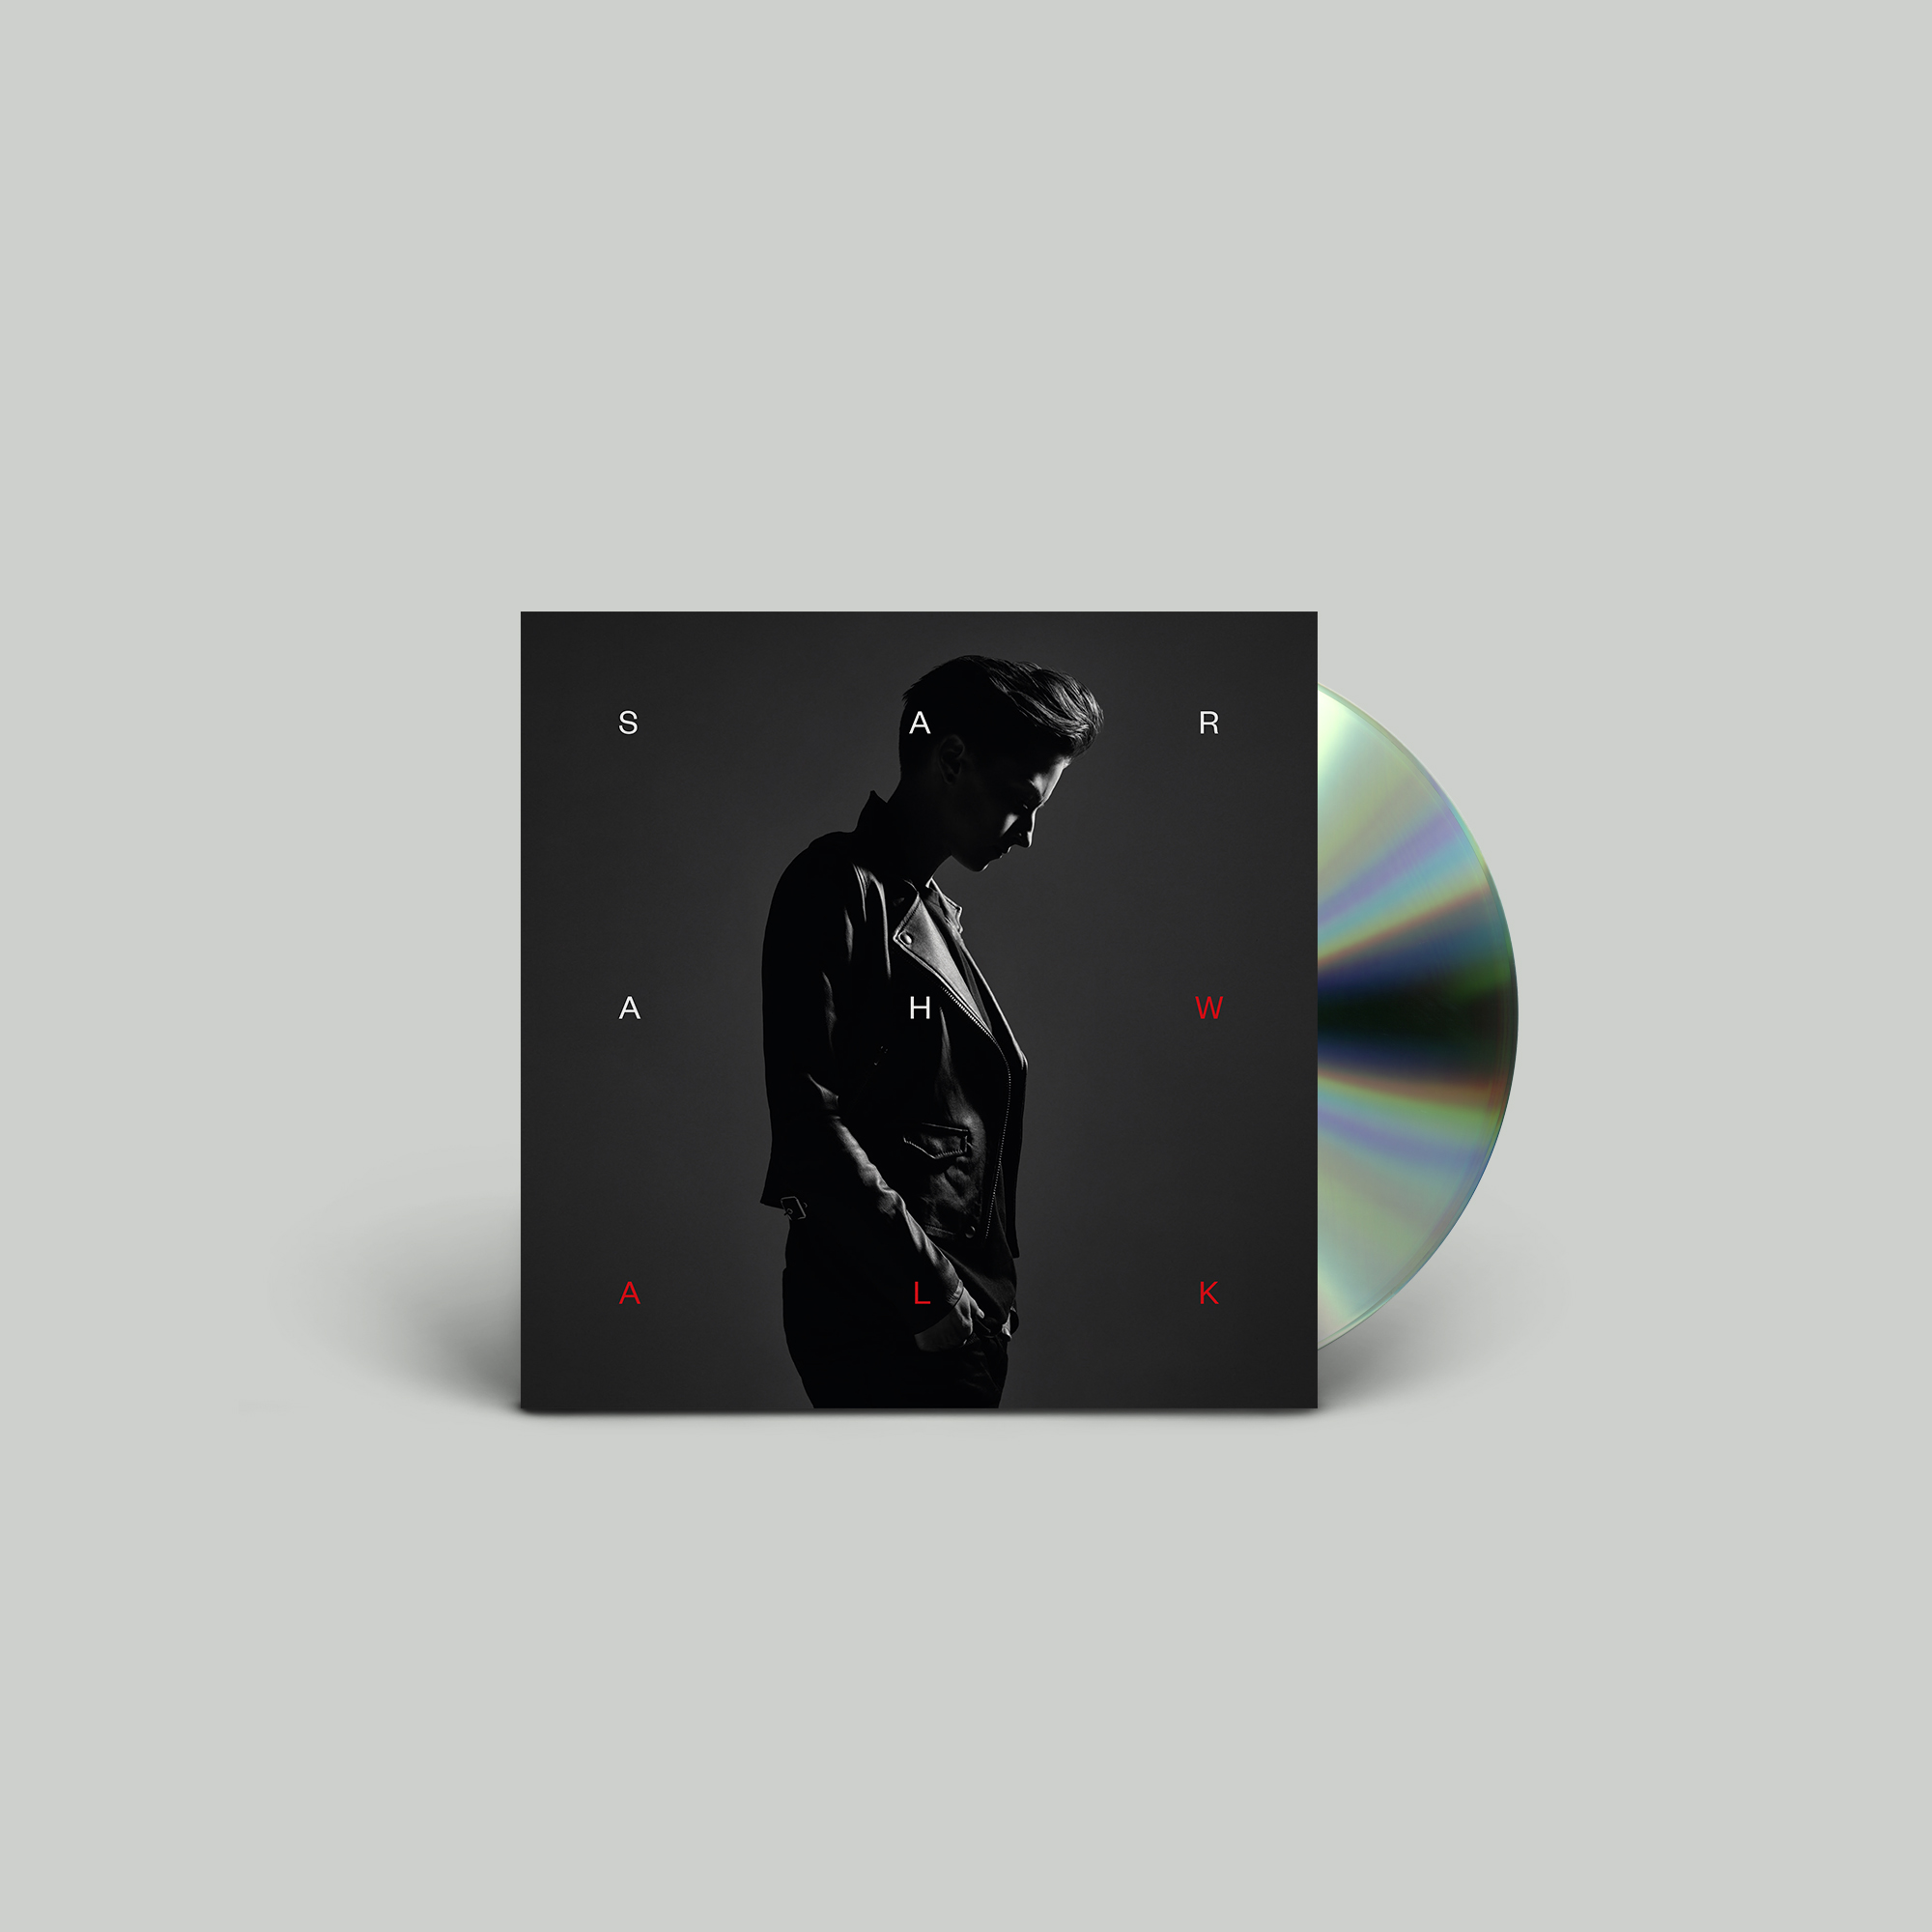 Little Black Book (CD) - Sarah Walk US